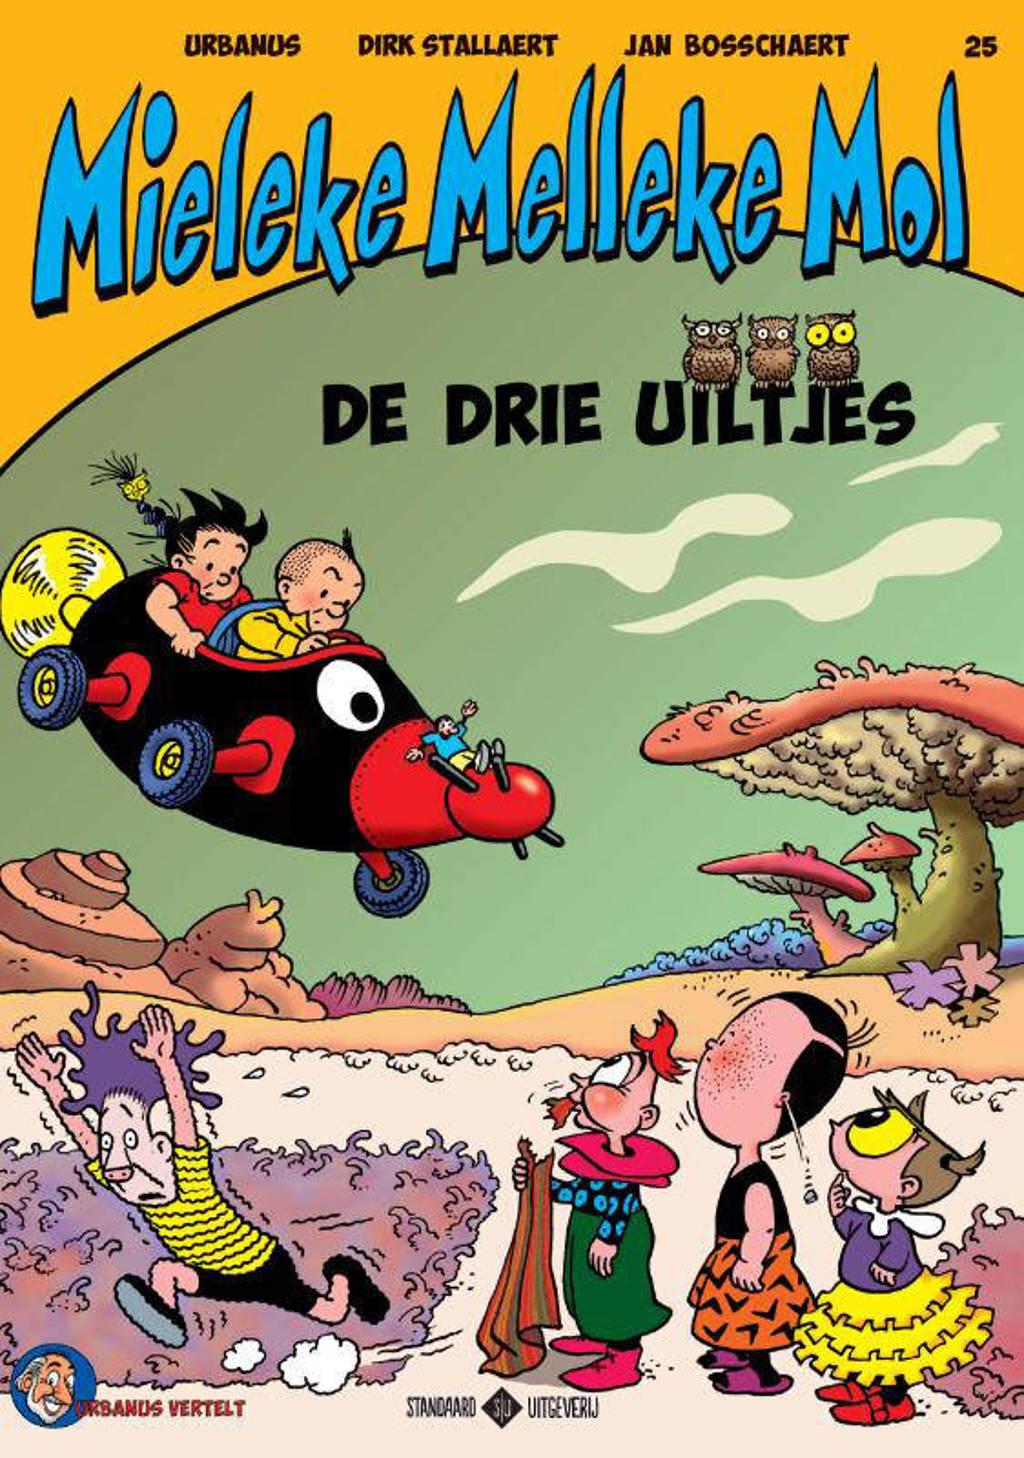 Mieleke Melleke Mol: De drie uiltjes - Dirk Stallaert en Urbanus